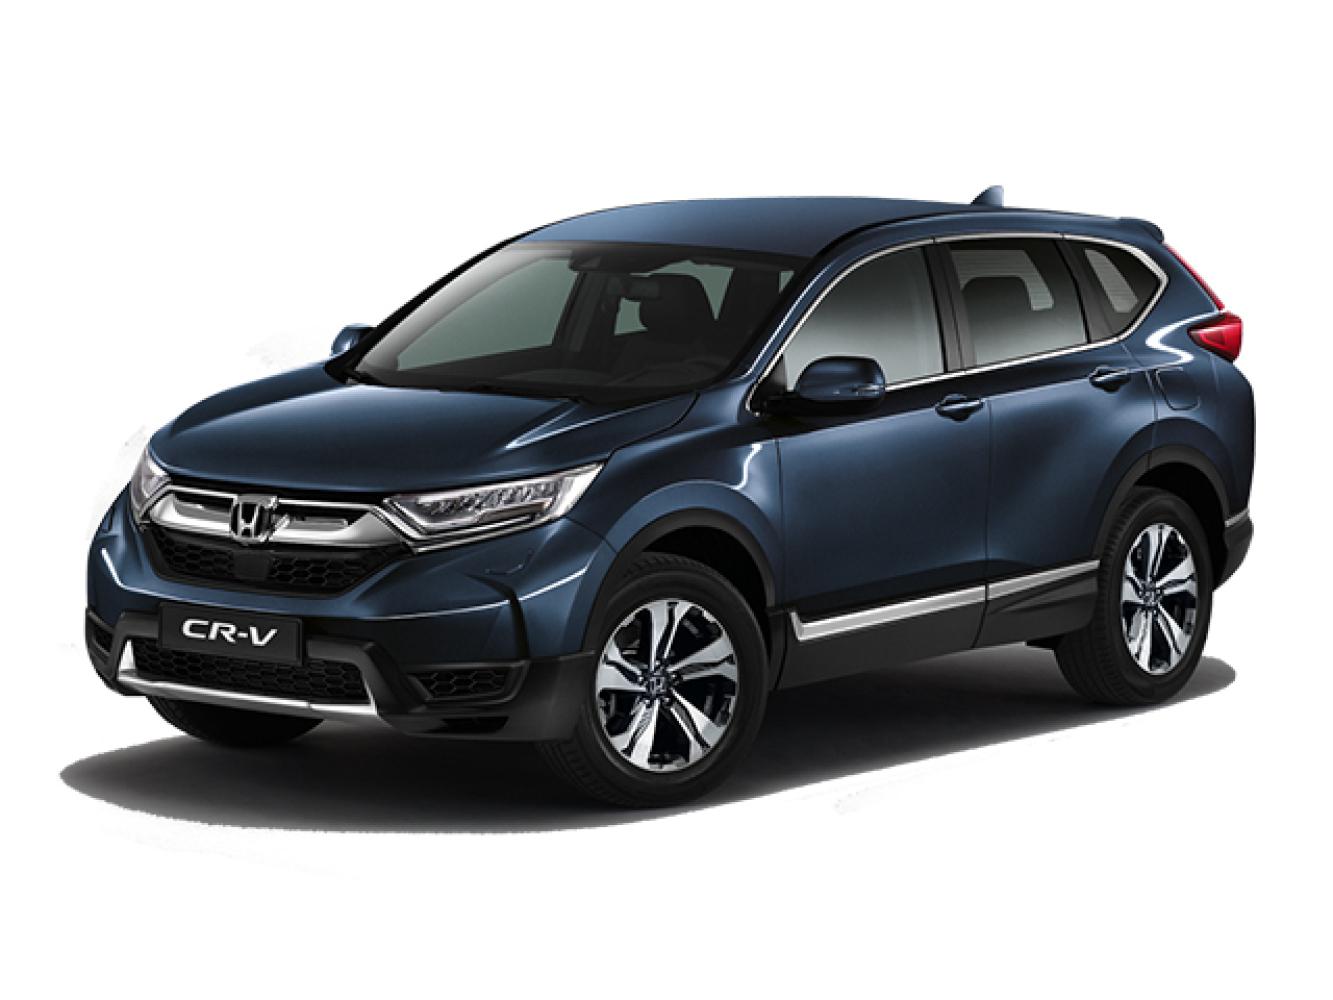 Honda Cr V 2 0 I Mmd Hybrid S 2wd 5dr Ecvt Estate